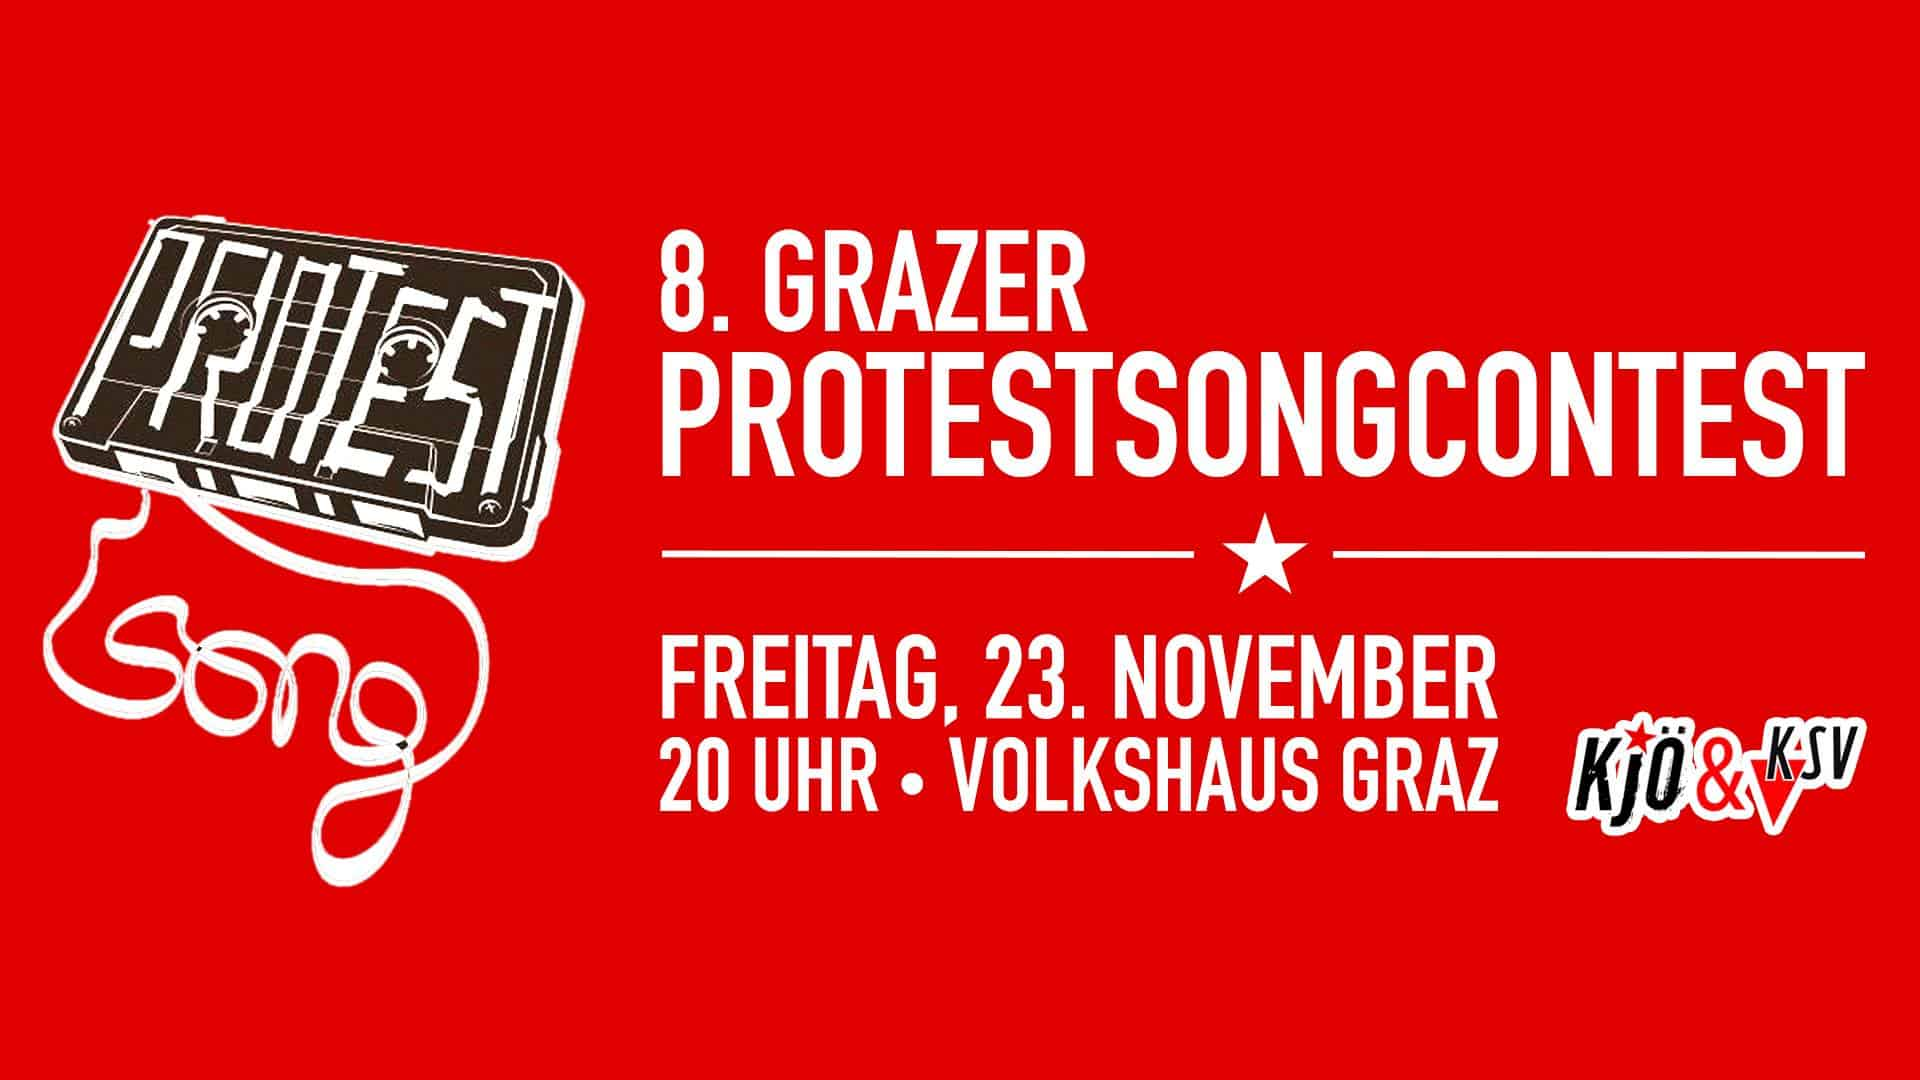 Veranstaltung: Grazer Protestsongcontest